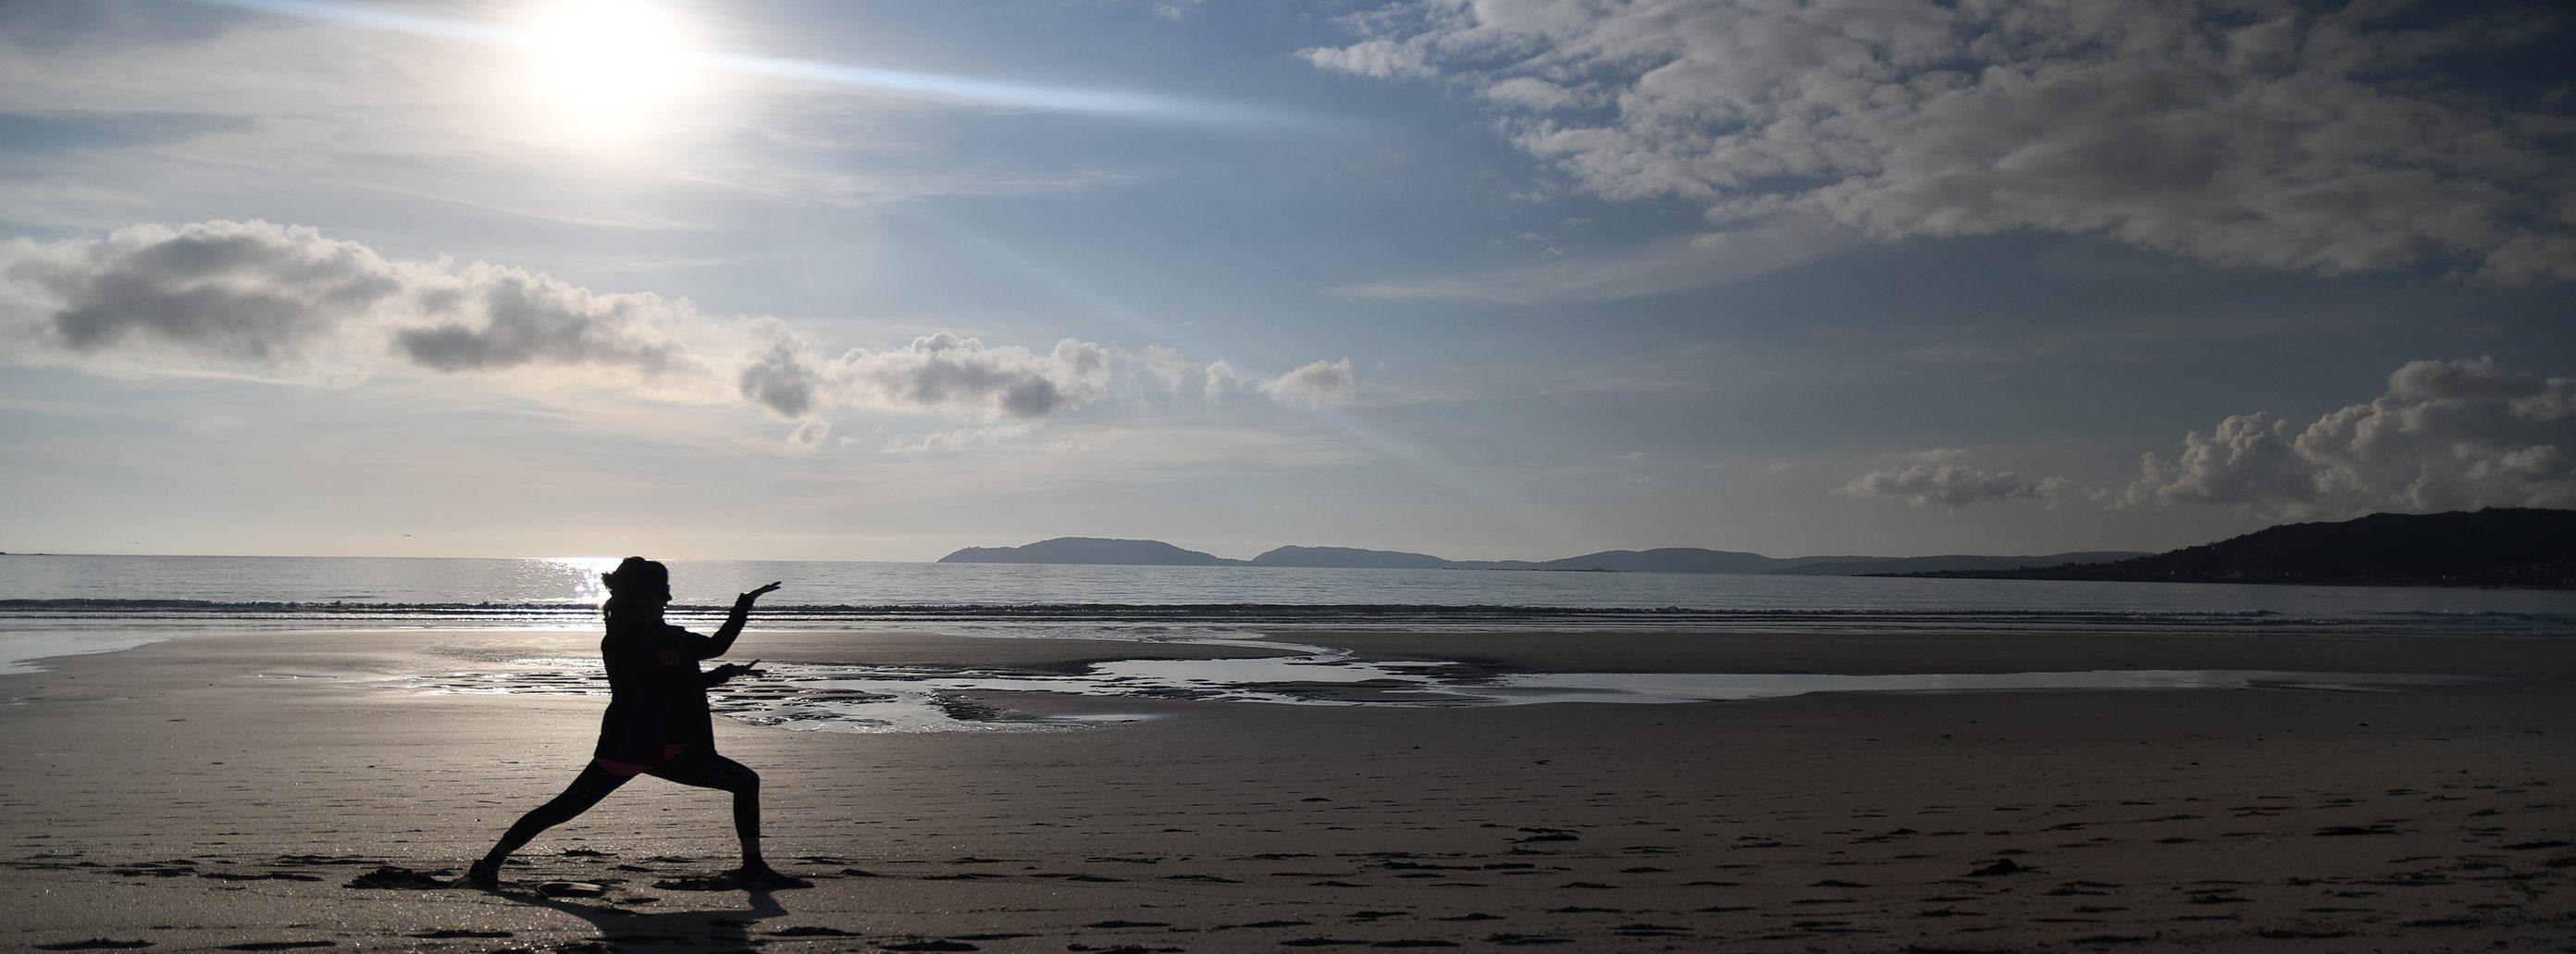 Aruna-yoga@hotmail.es